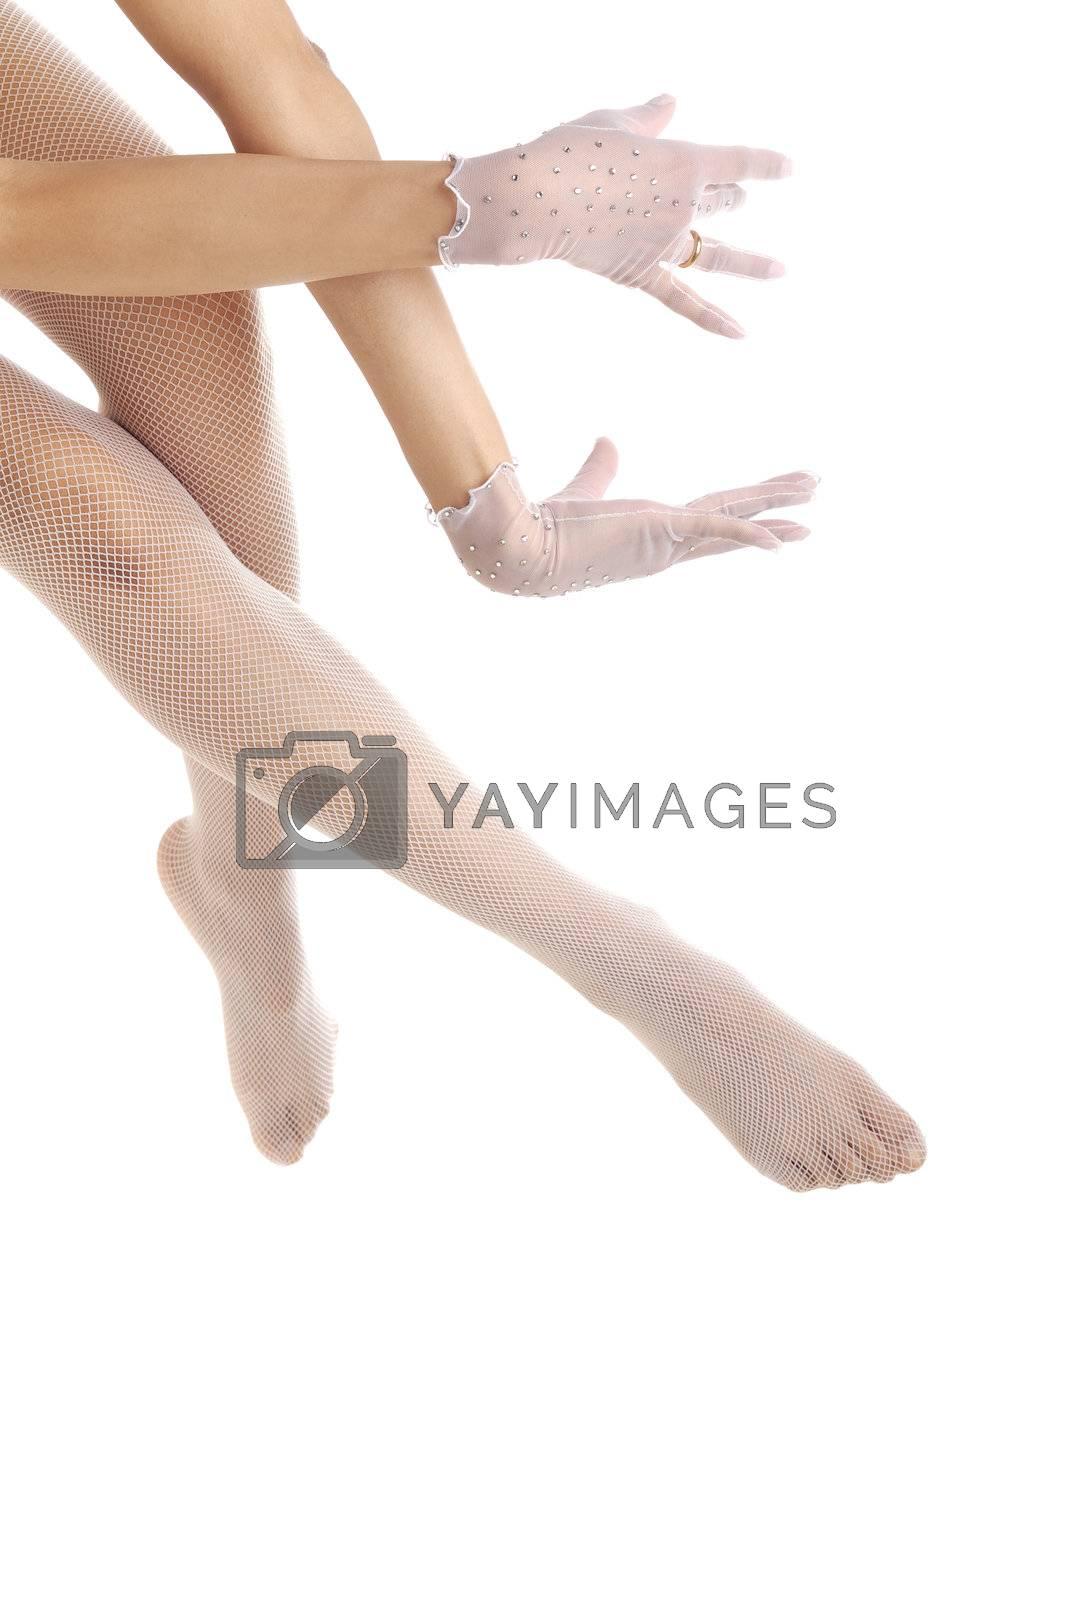 Elegant bridal legs and hands dancing ballet